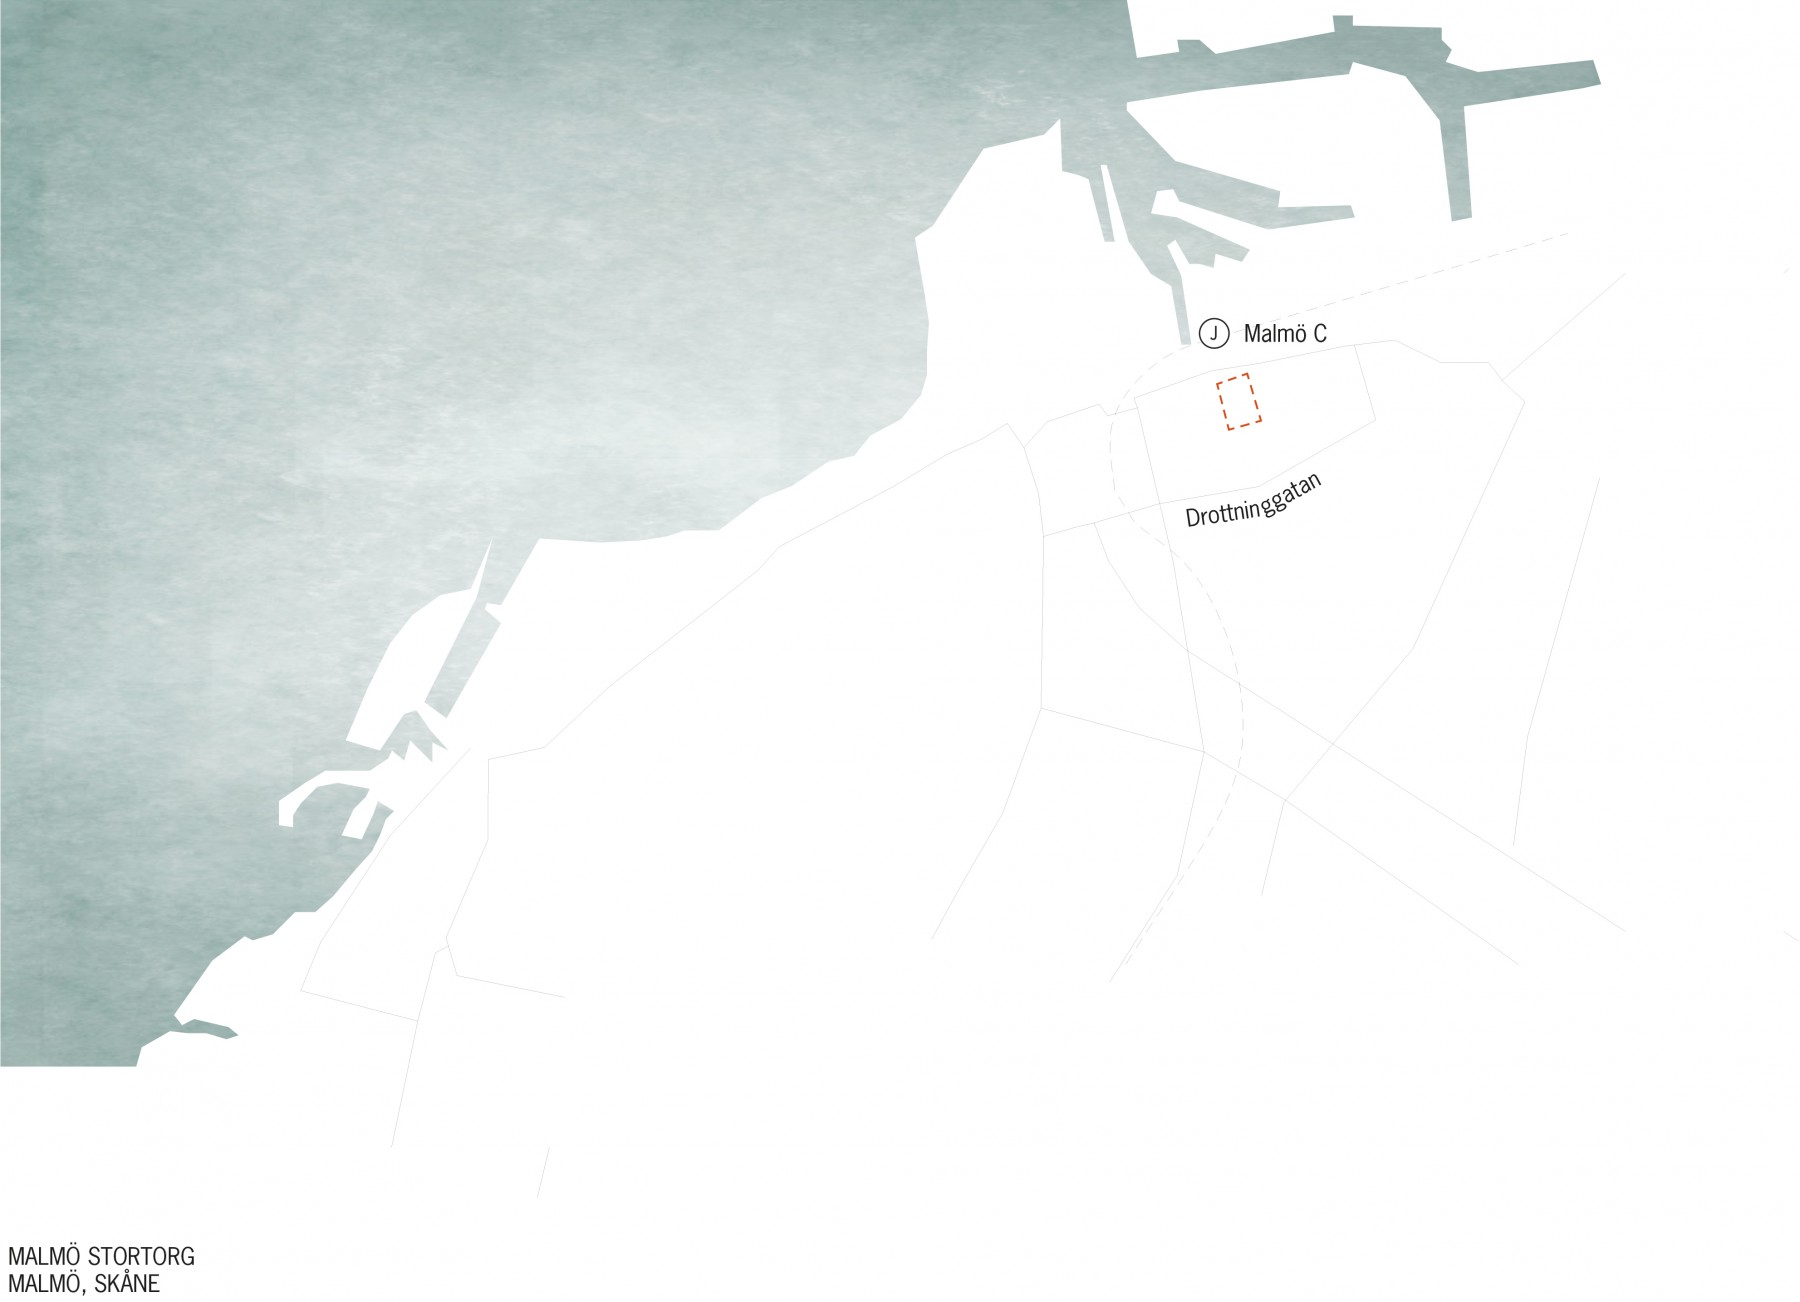 Stortorget_Malmo_LAND_2010_karta